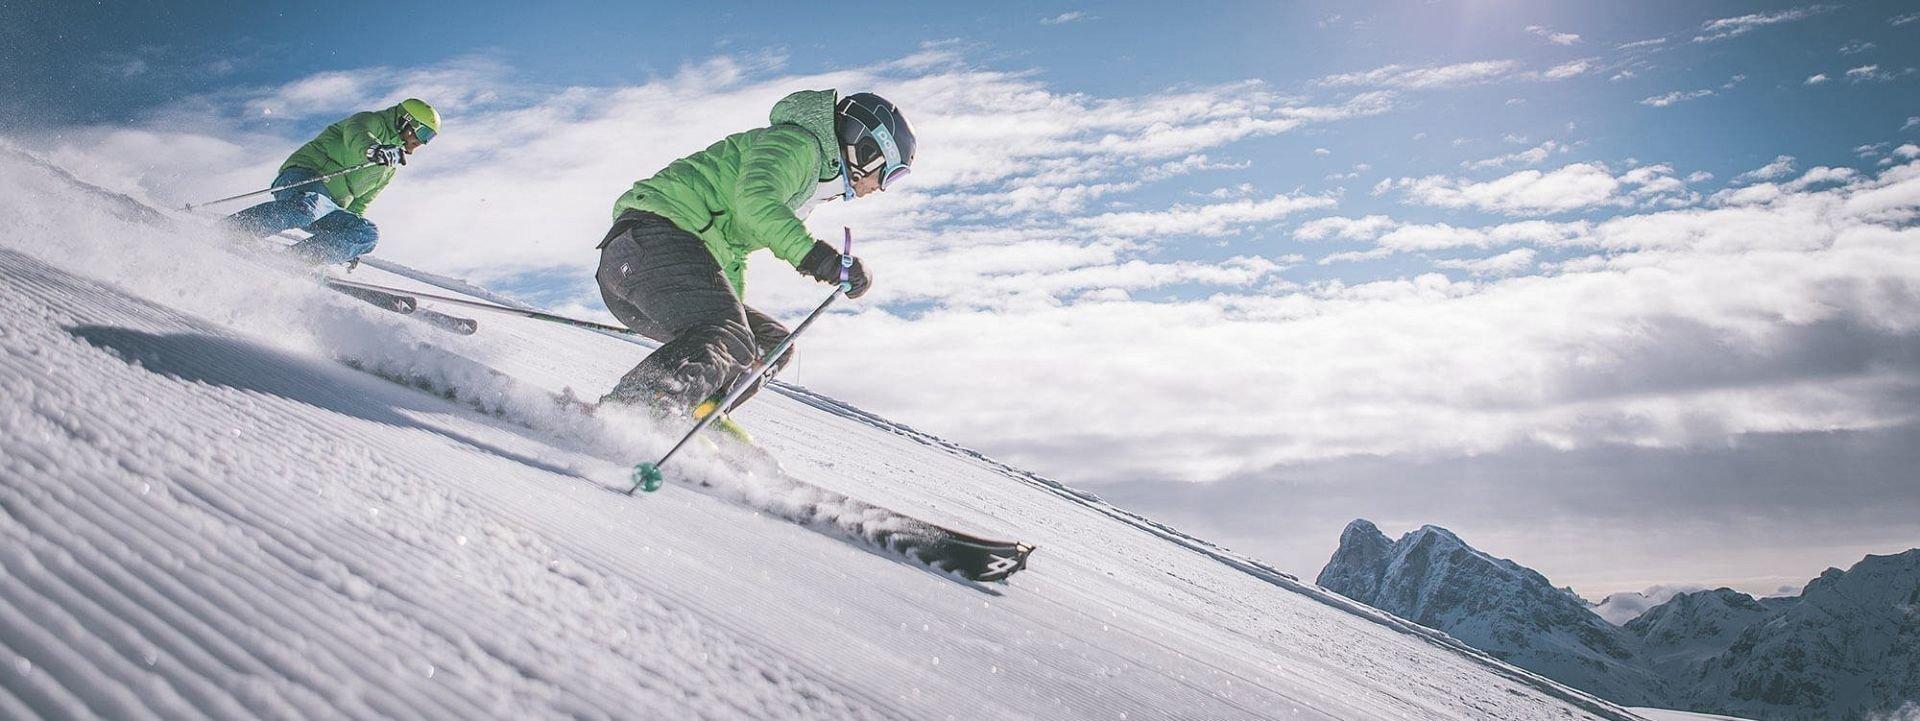 Hoferhof Brixen | Skiing in the Plose ski area in the Dolomites World Heritage Site